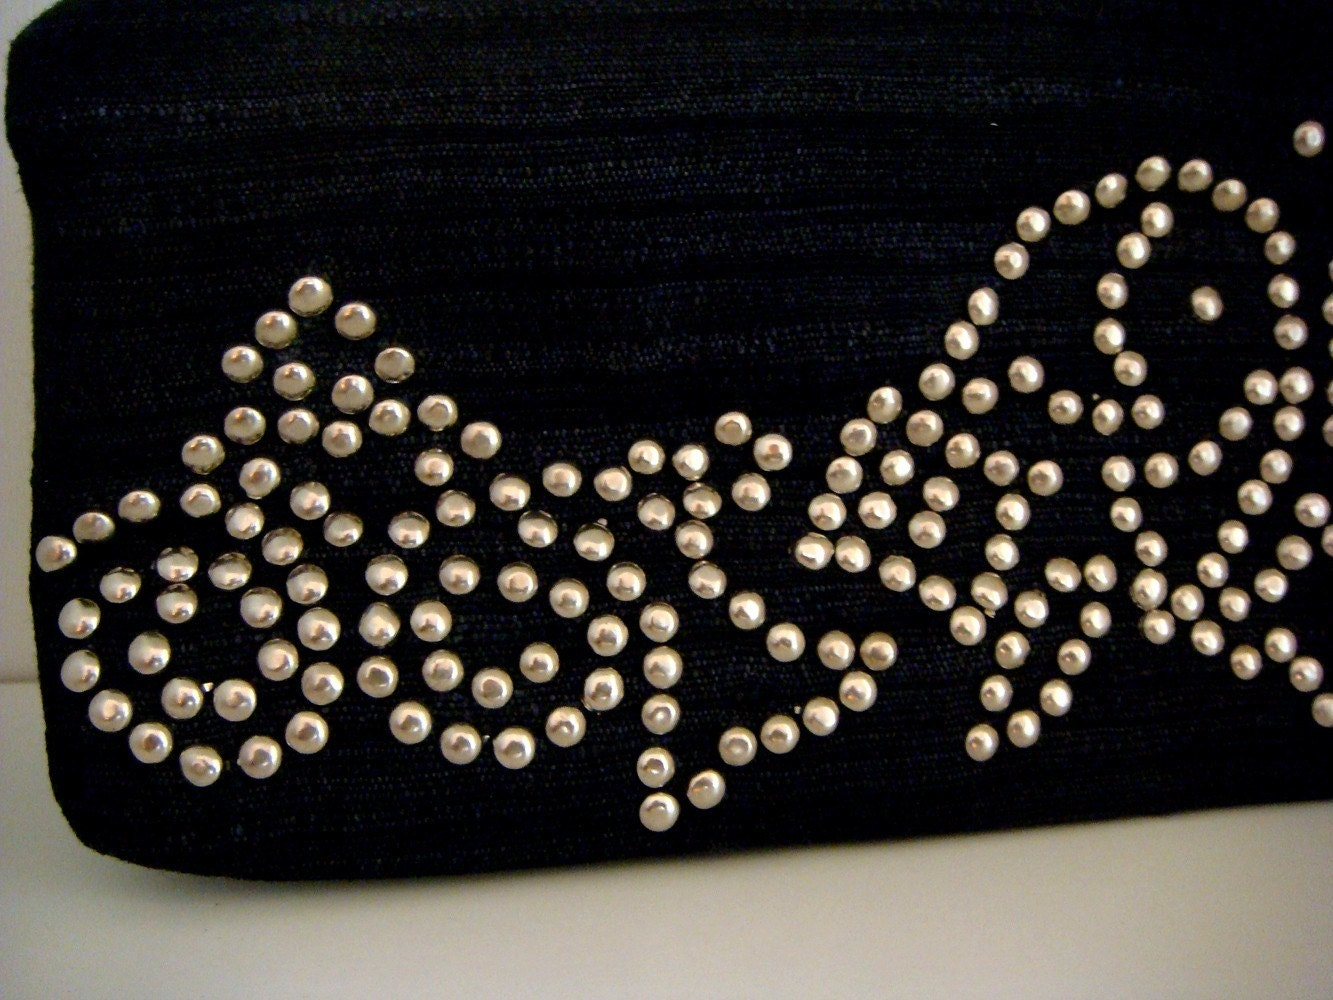 esoneofone Soho handbag